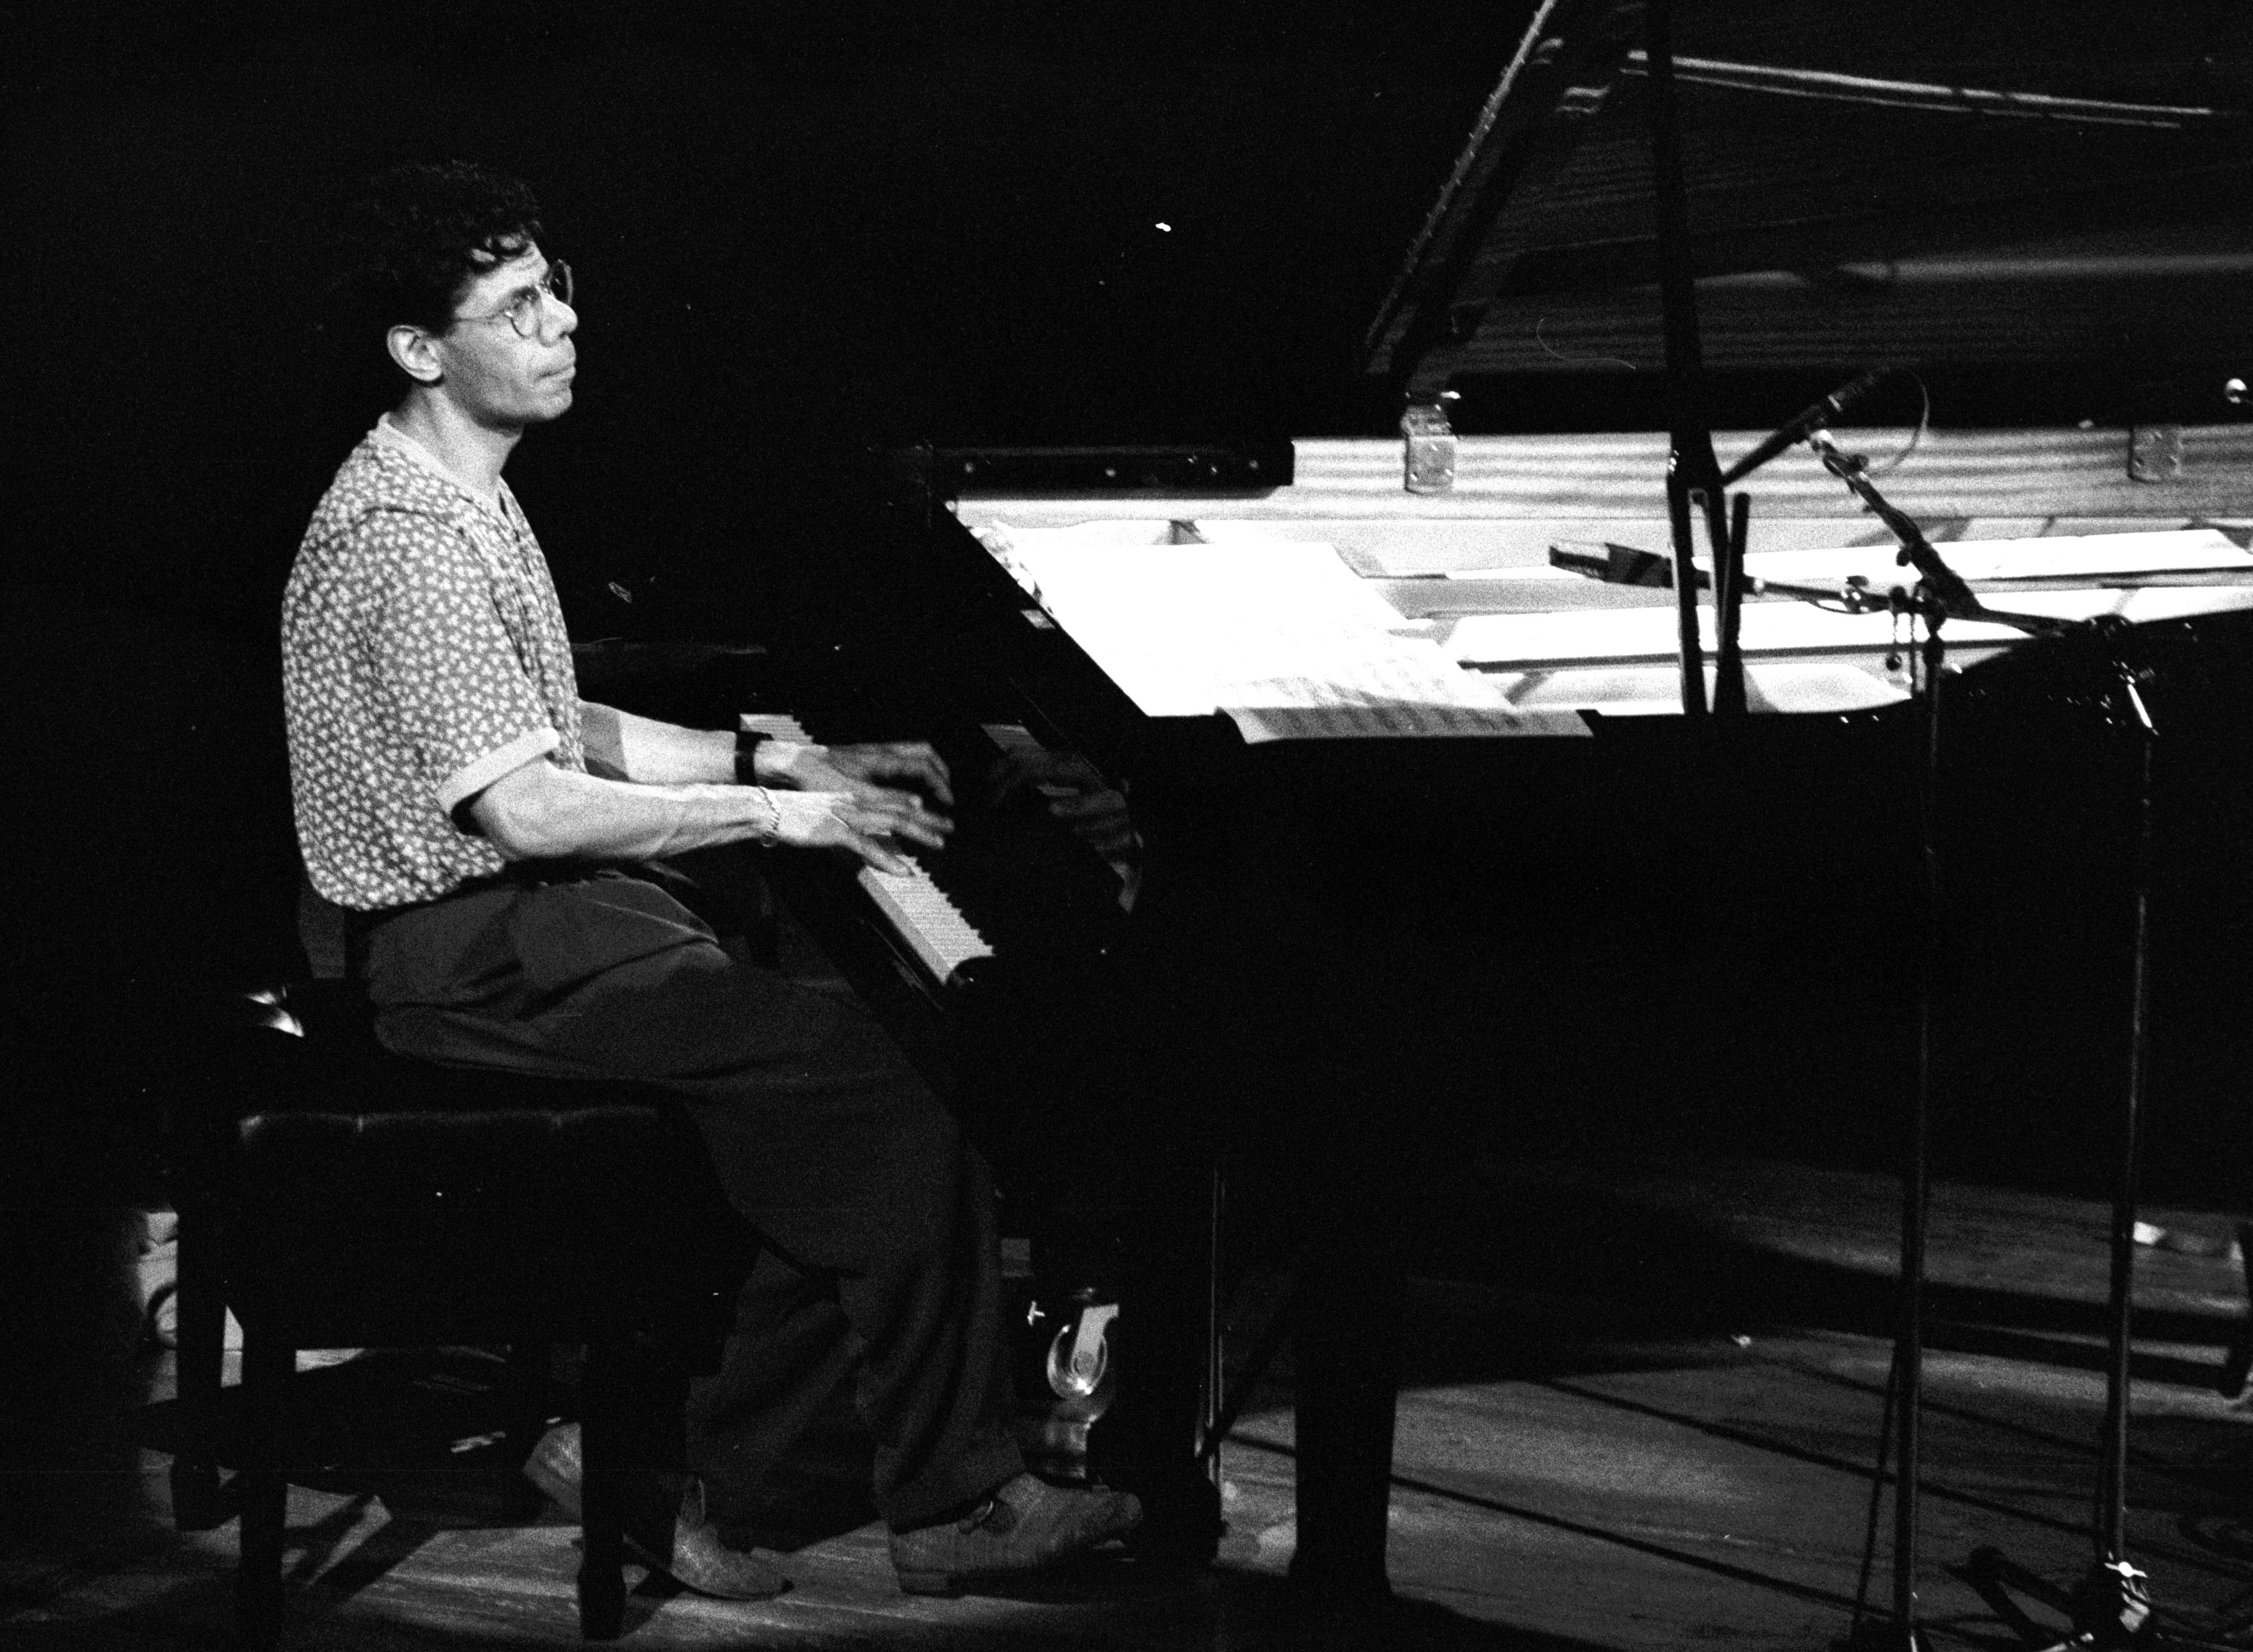 Chick Corea & Nicolas Economou On Two Pianos